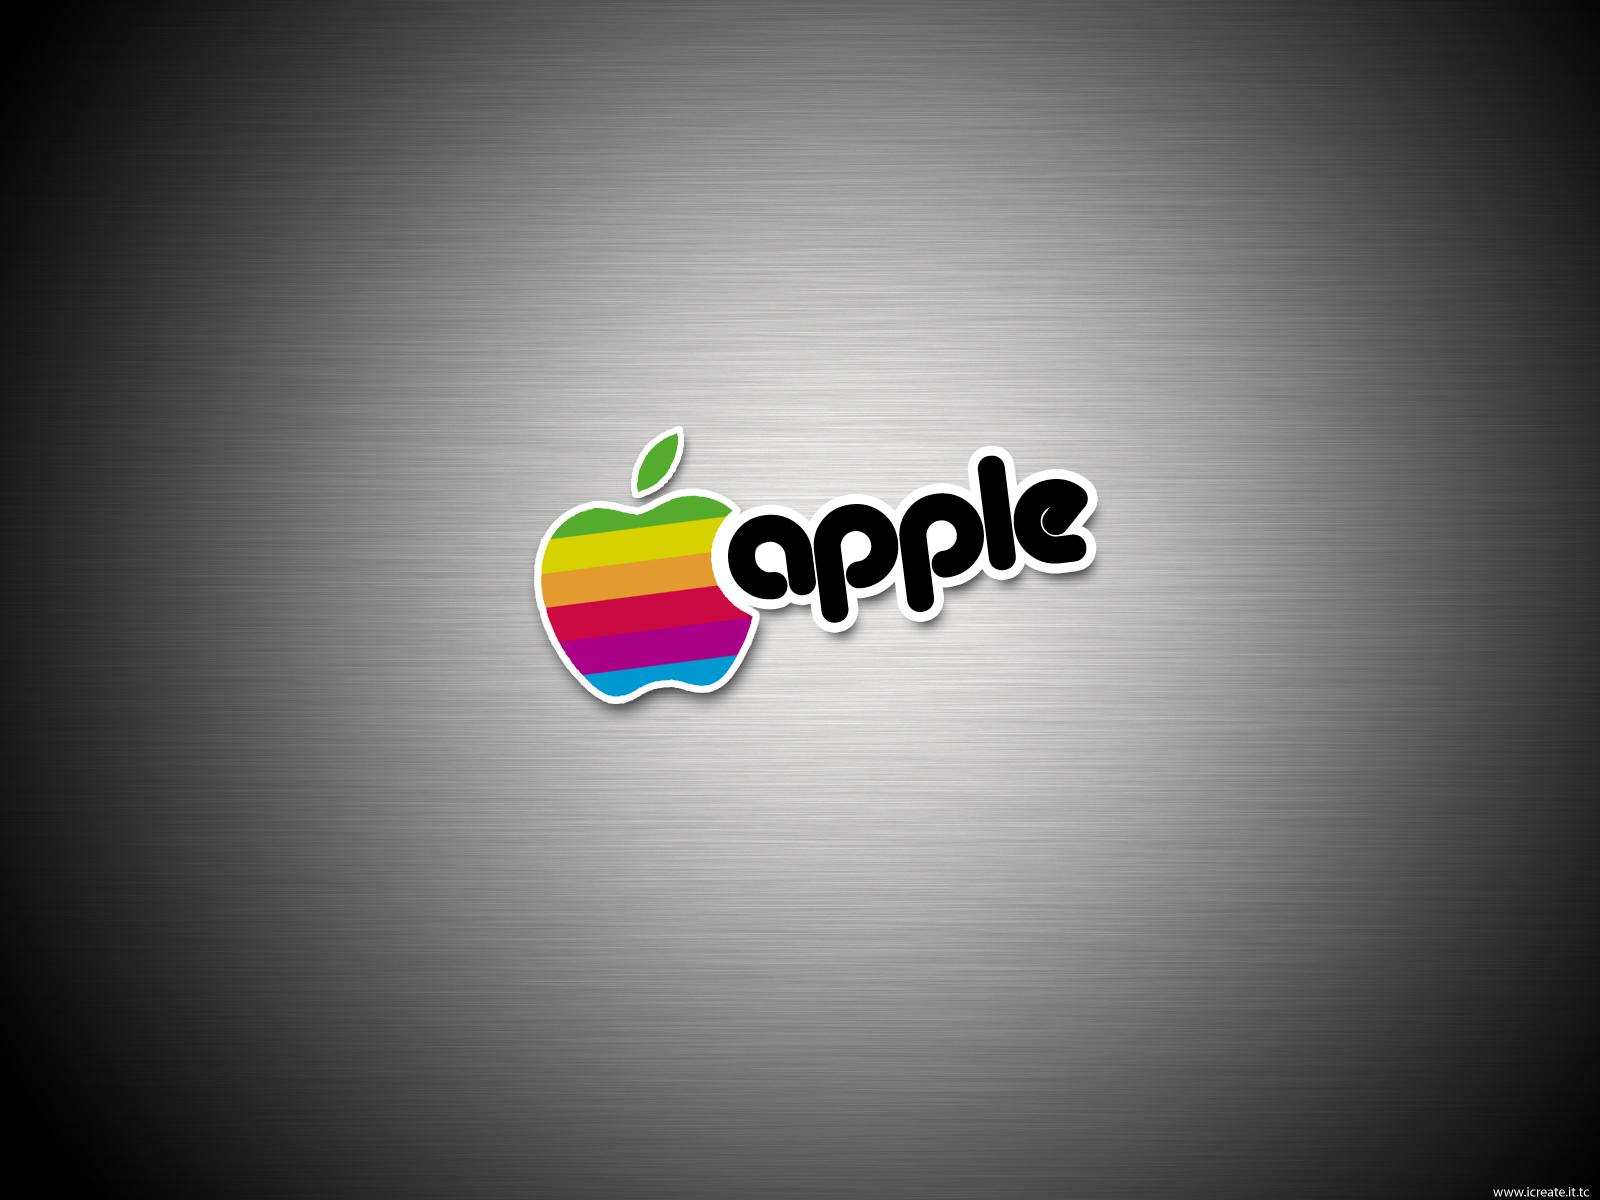 Bmw Car Hd Wallpaper Apple Macintosh Wallpapers Hd Nice Wallpapers